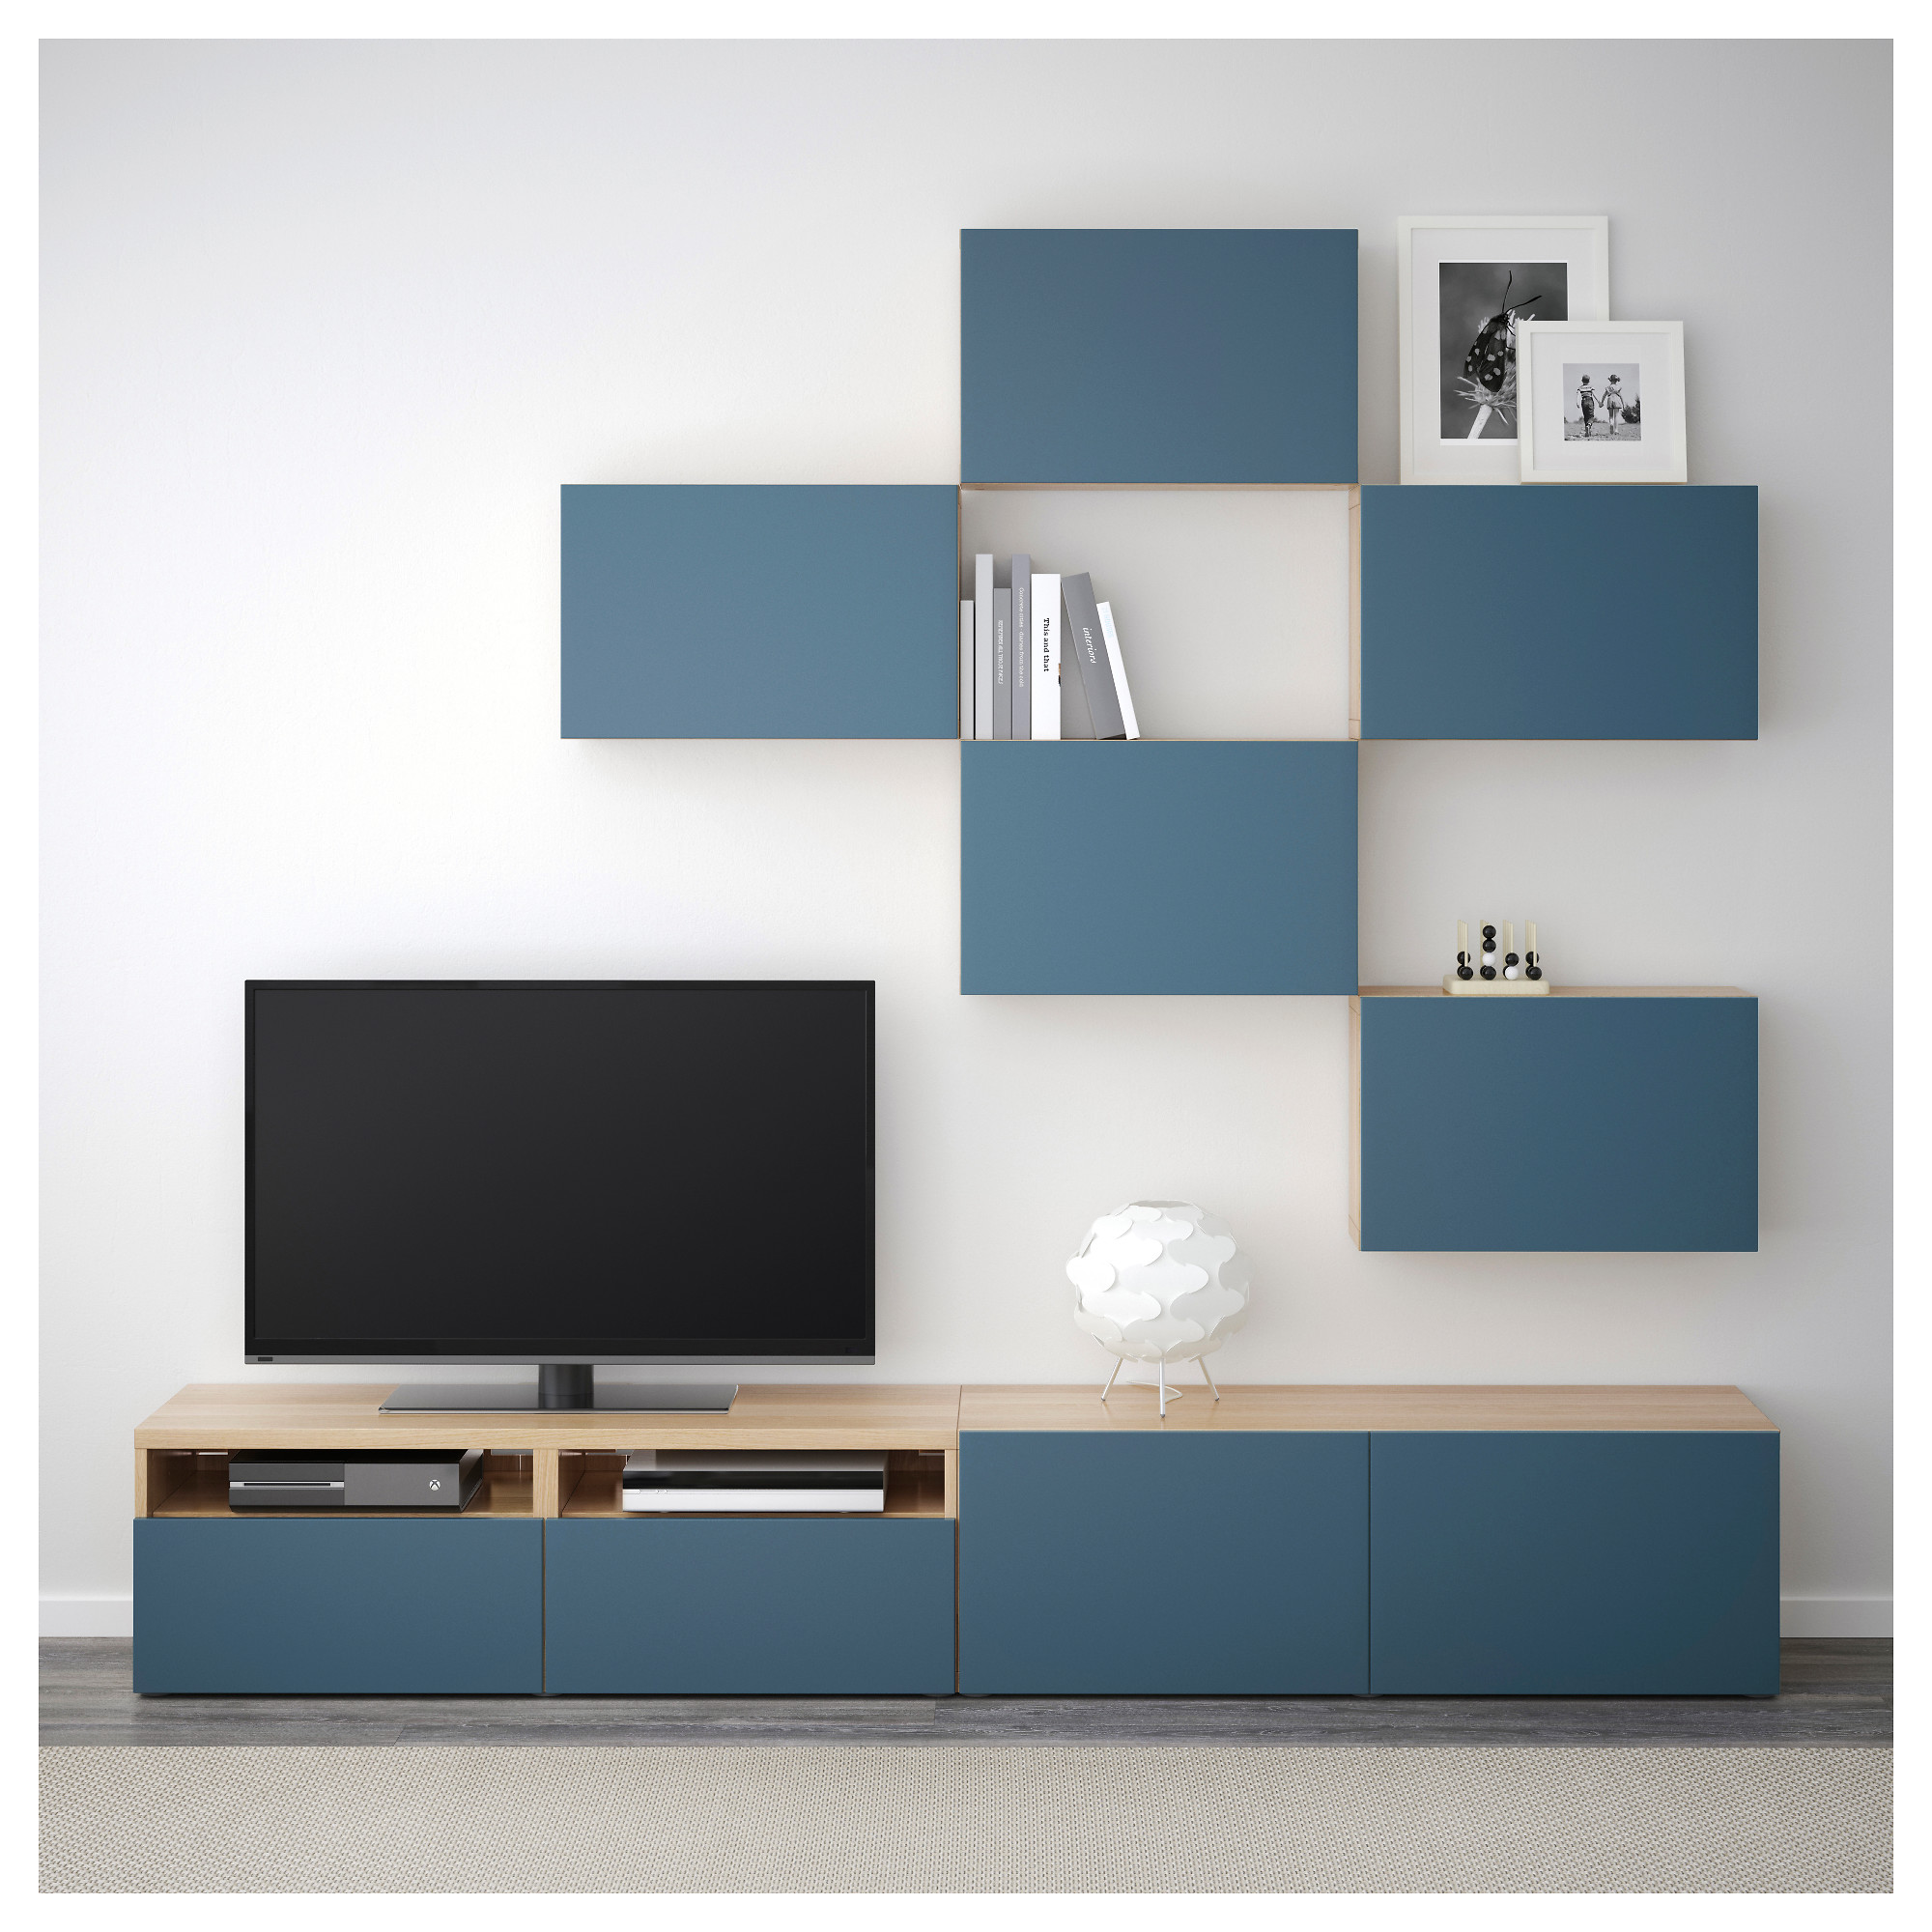 Шкаф для ТВ, комбинация БЕСТО темно-синий артикуль № 792.516.65 в наличии. Онлайн сайт IKEA РБ. Недорогая доставка и соборка.